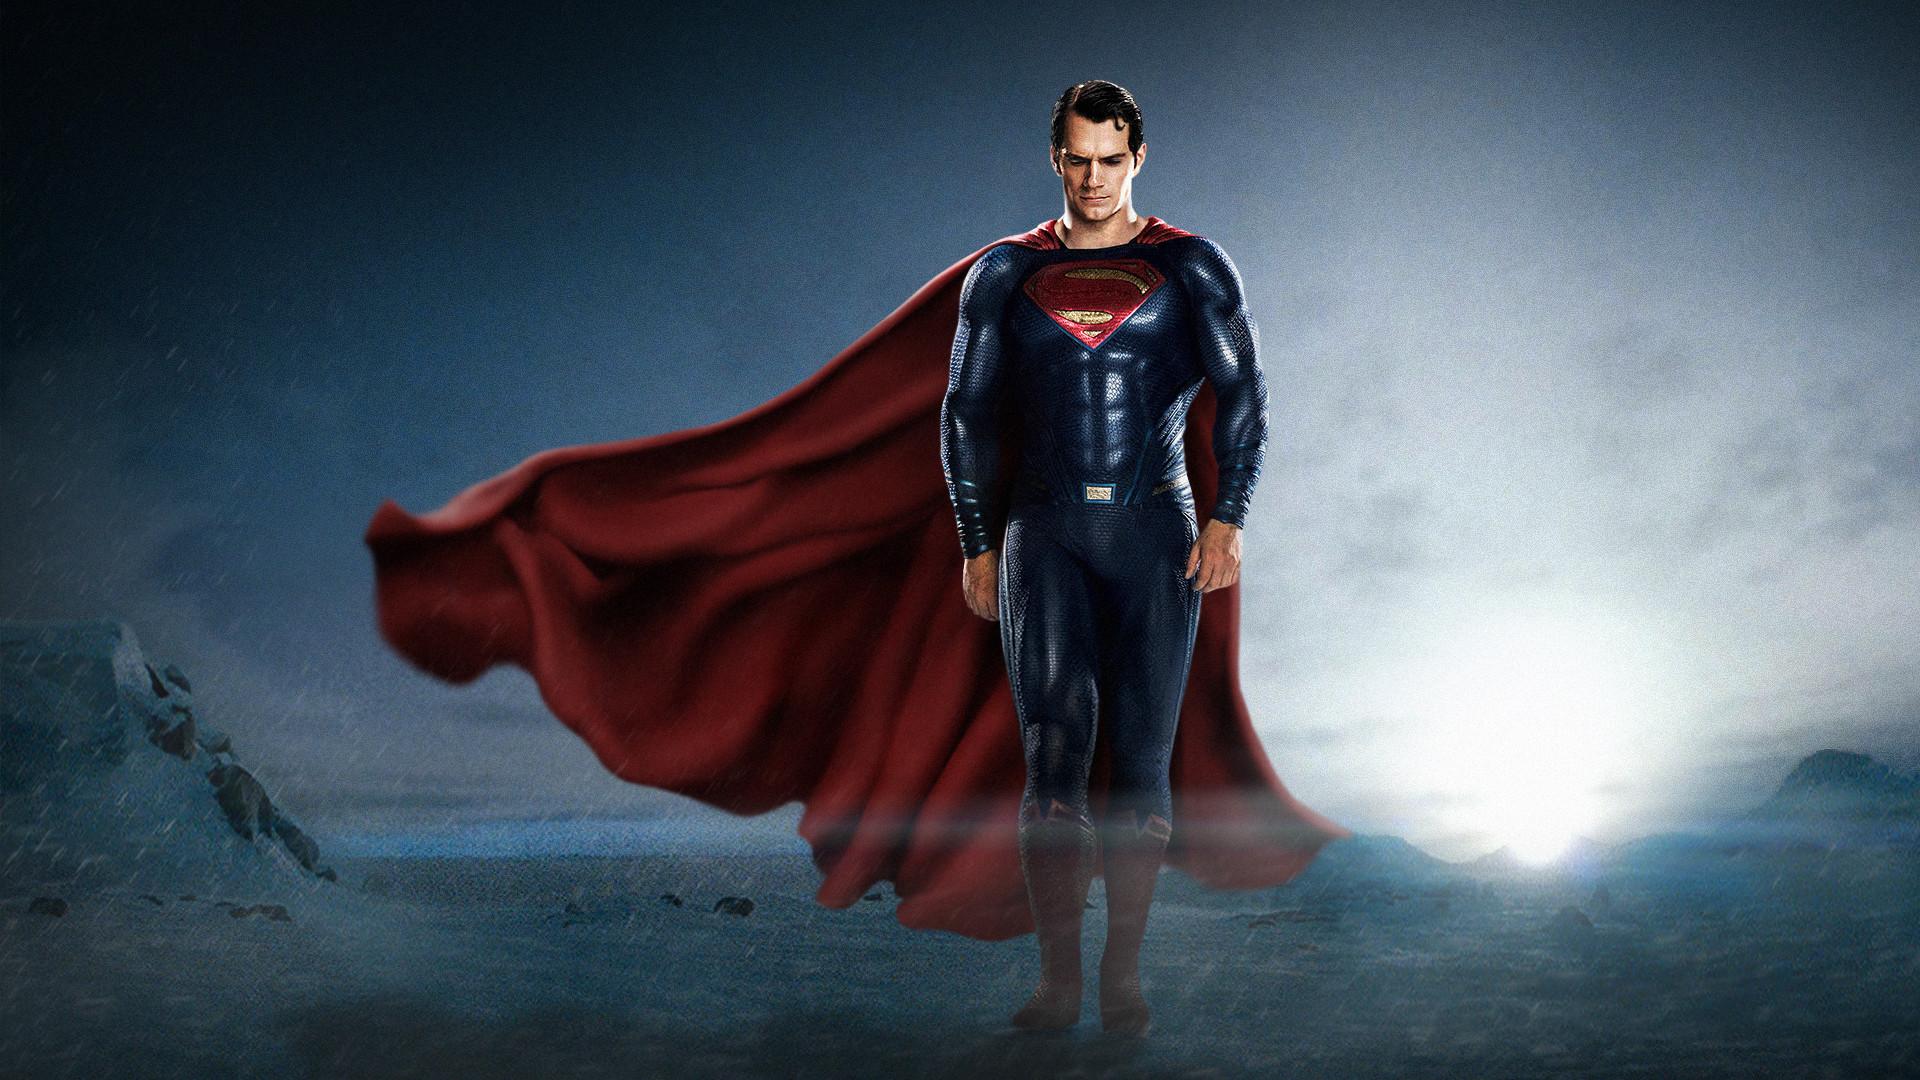 Superman Walking by LoganChico Superman Walking by LoganChico